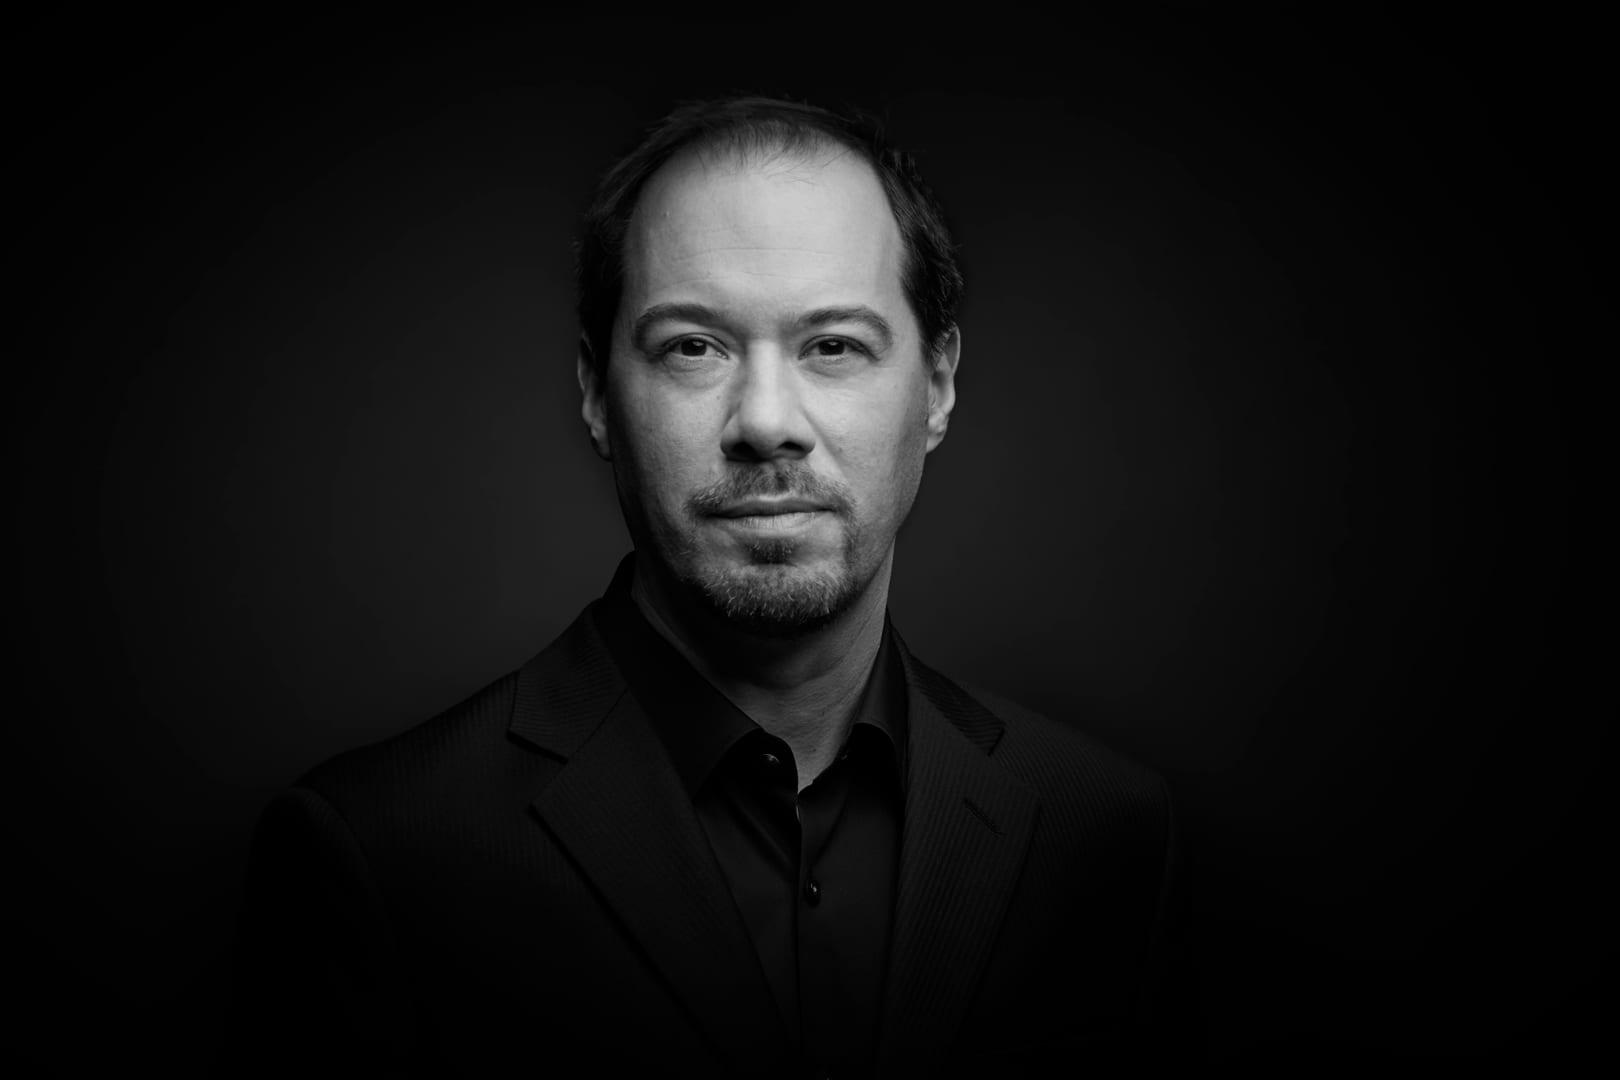 Gunnar_Menzel_Portraitfotograf_40